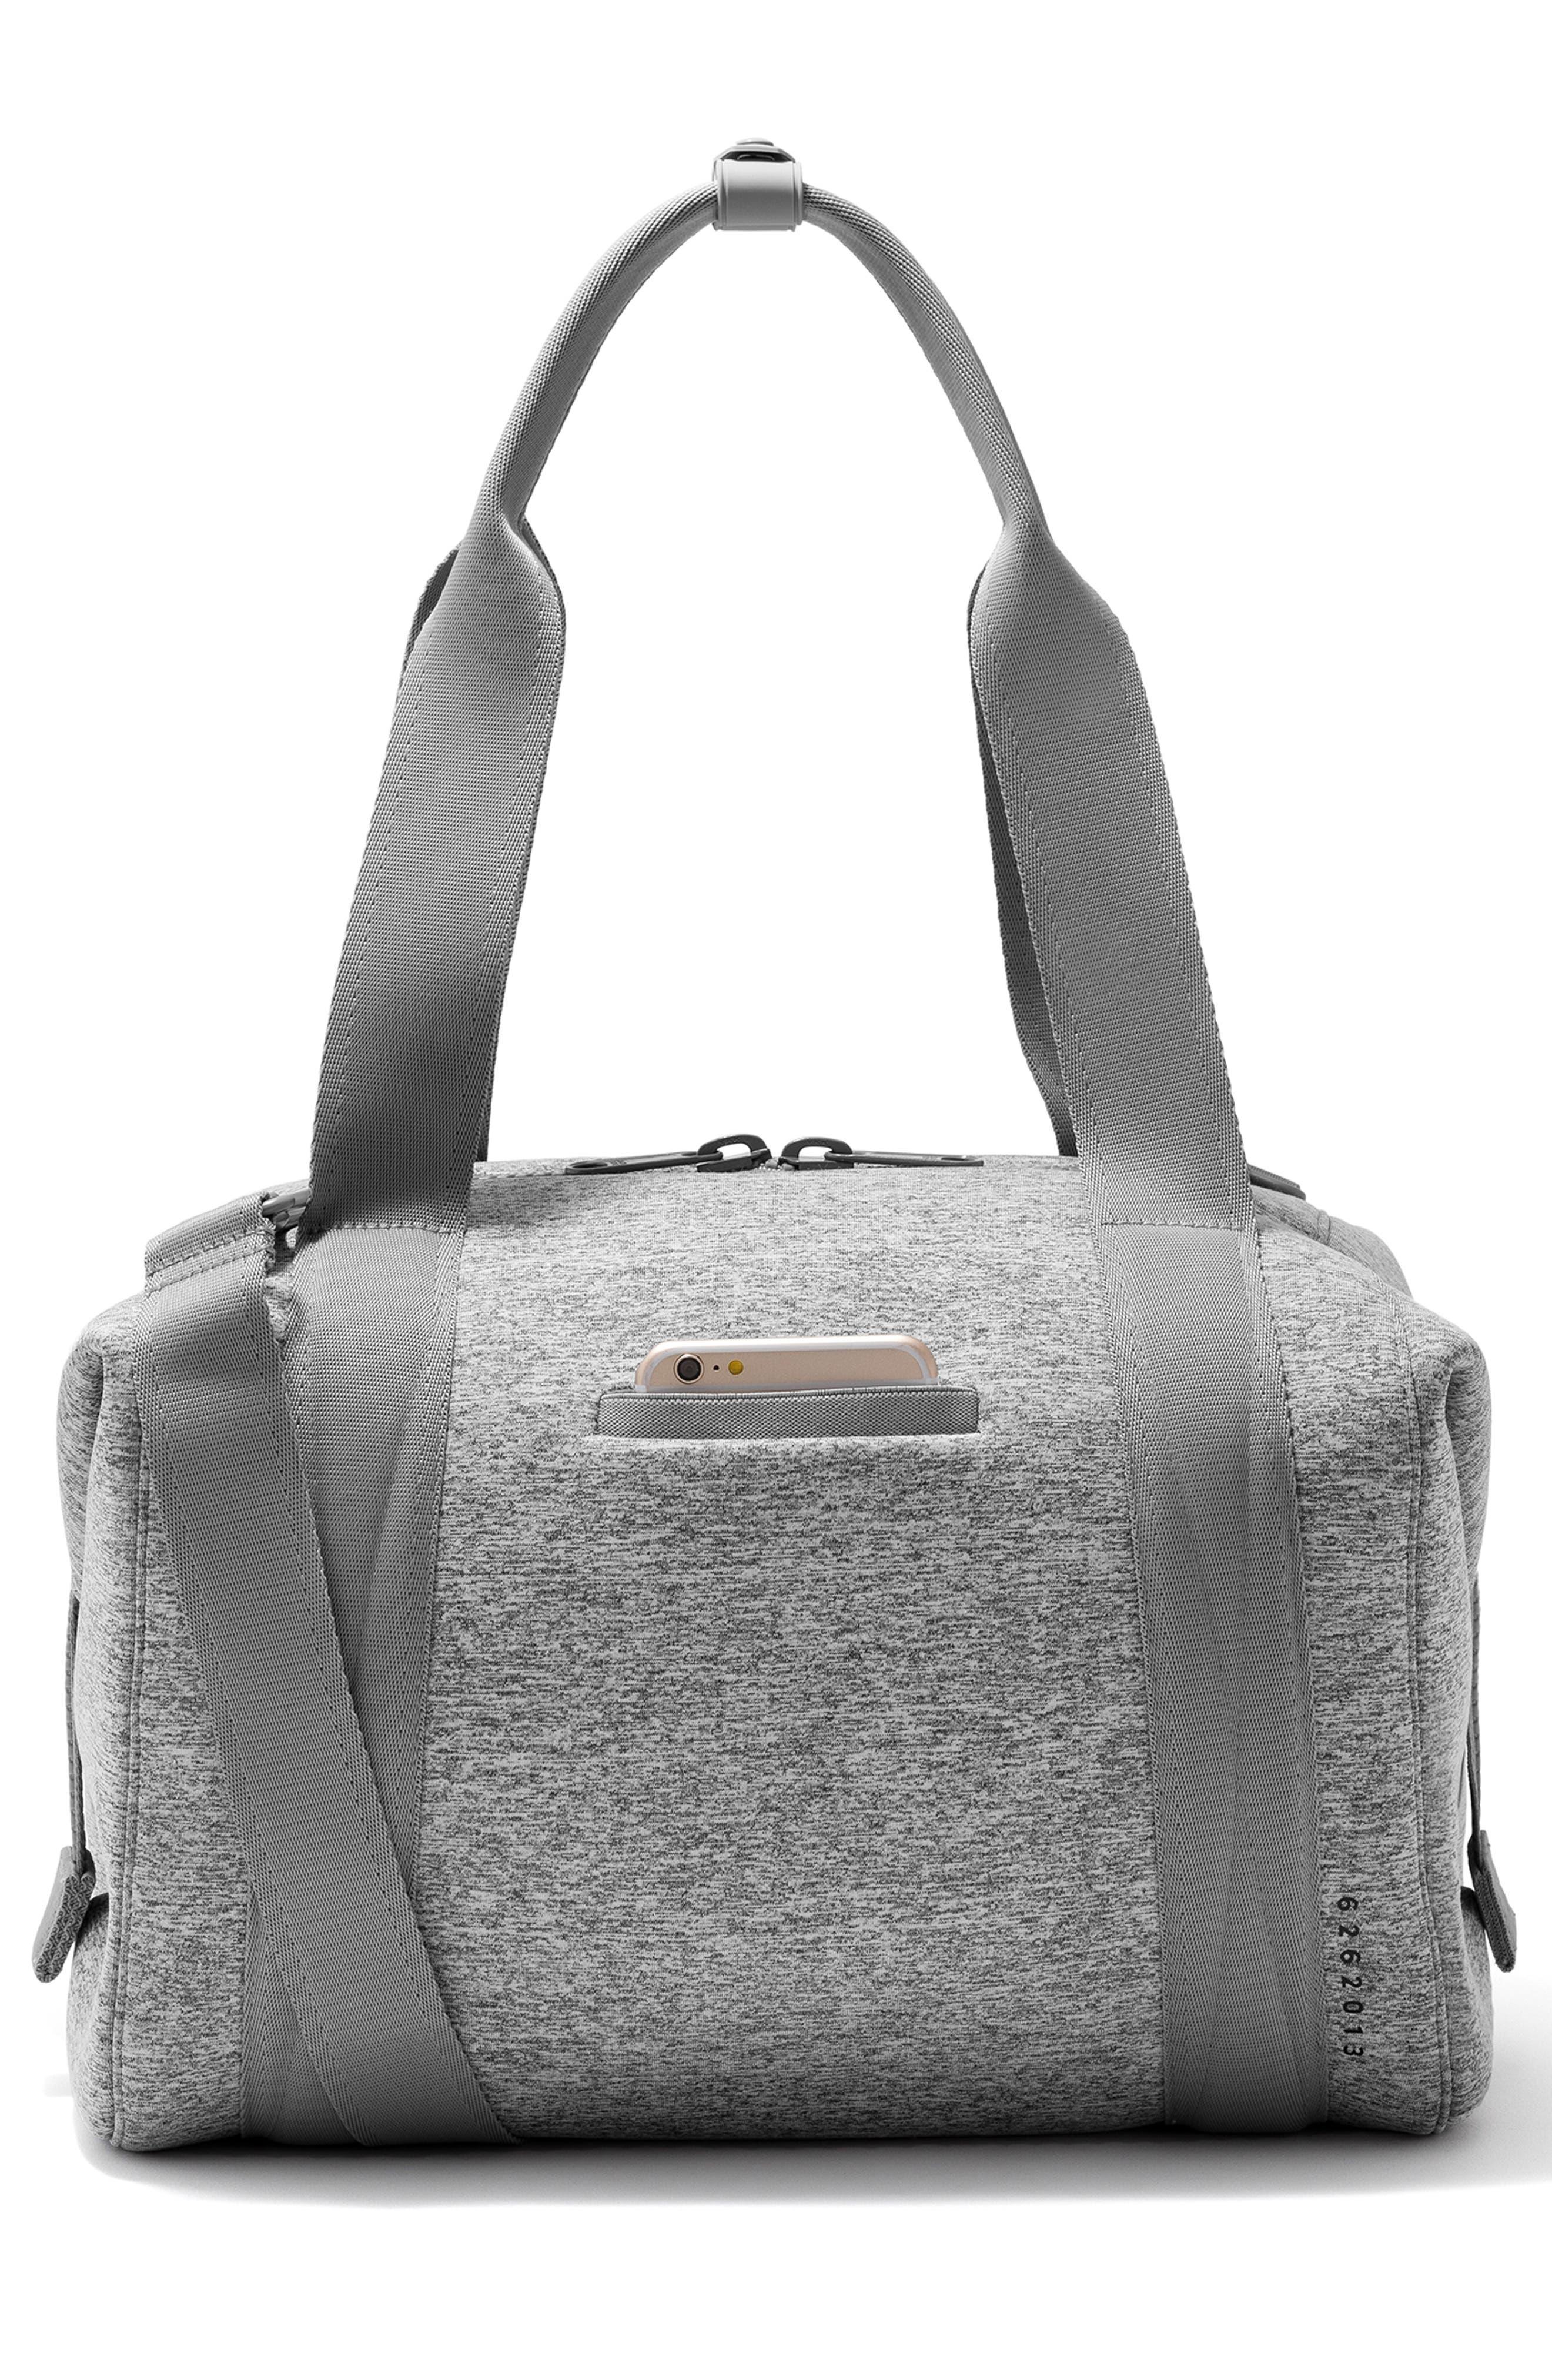 365 Medium Landon Neoprene Carryall Duffel Bag,                             Alternate thumbnail 4, color,                             HEATHER GREY